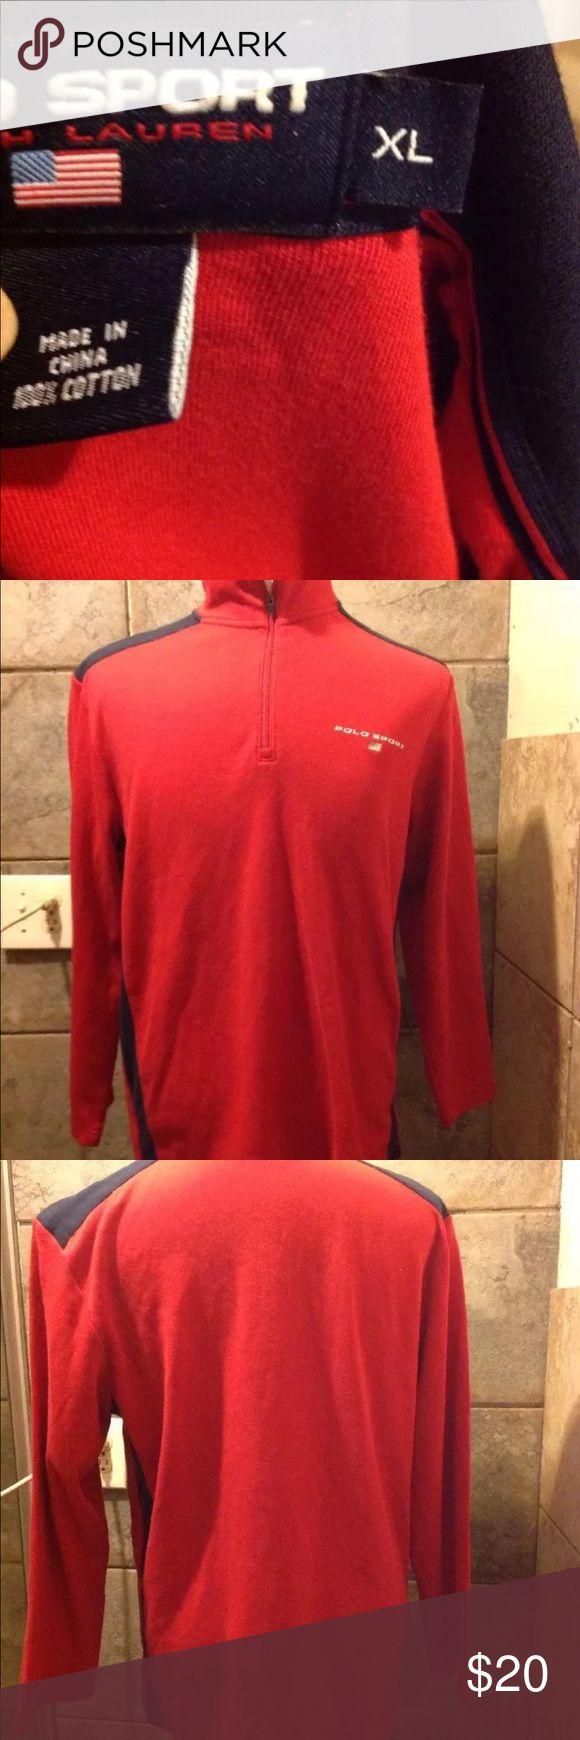 Raph Lauren polo sweater shirt red blue zip sleeve God condition, size xl long sleeve raph lauren sport Sweaters V-Neck